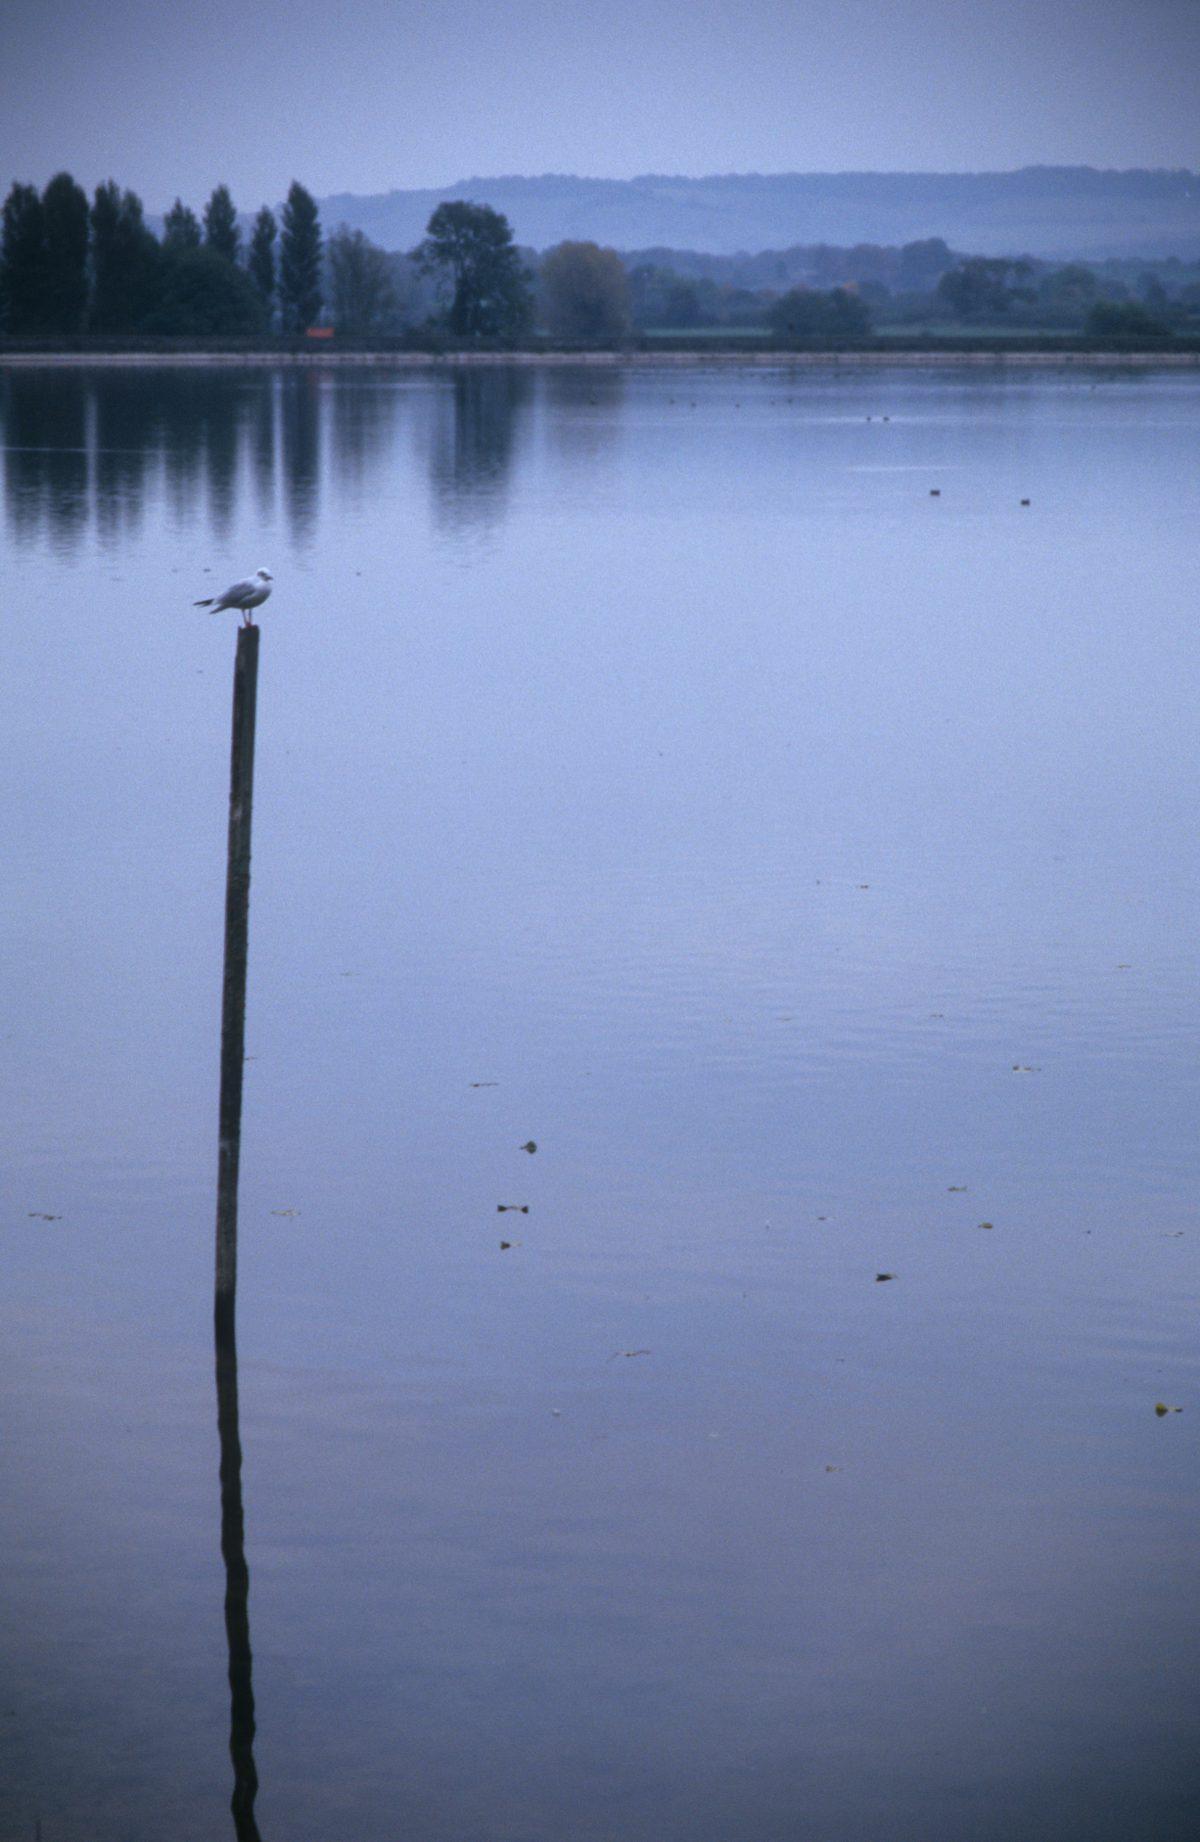 Birdwatching, bird, water